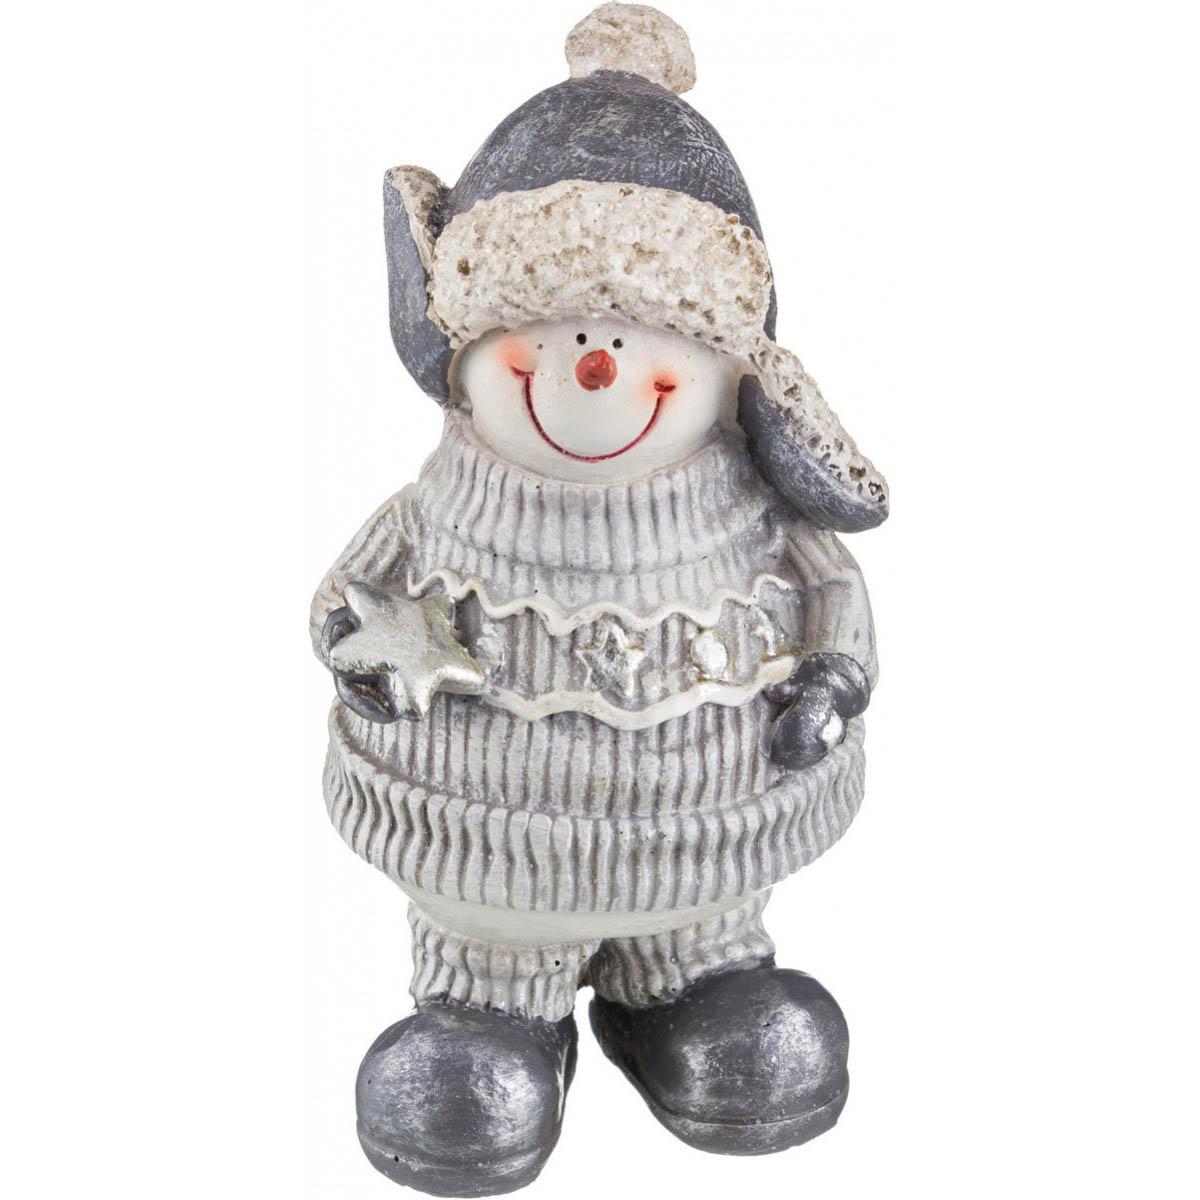 {} Arti-M Интерьерная игрушка Снеговик (6х7х13 см) статуэтка снеговик 13 см